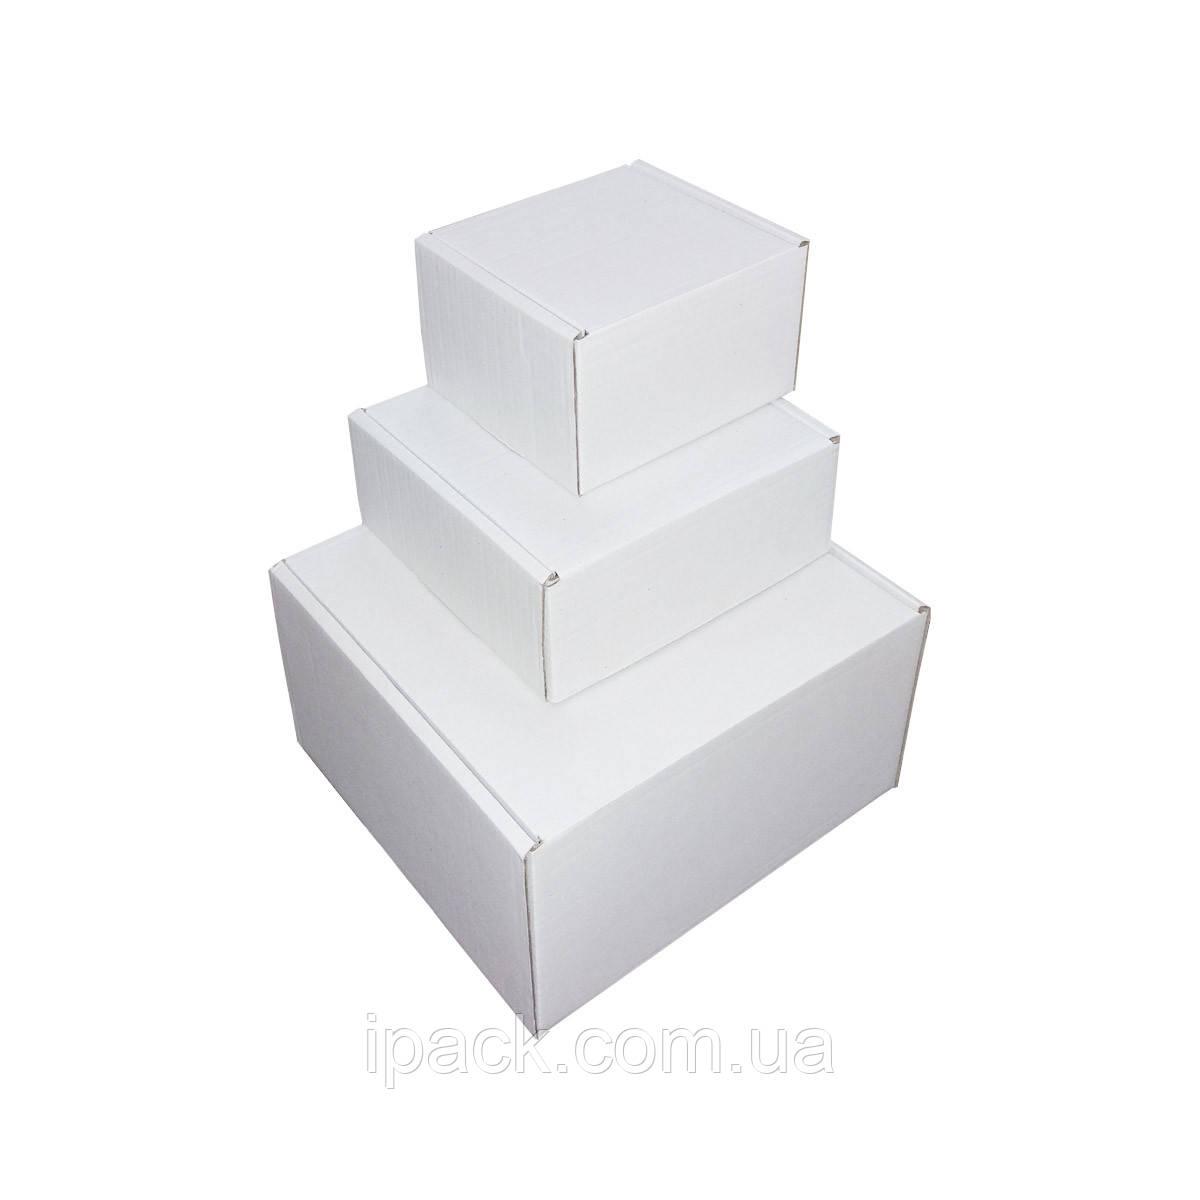 Коробка картонная самосборная, 225*160*50, мм, белая, микрогофрокартон